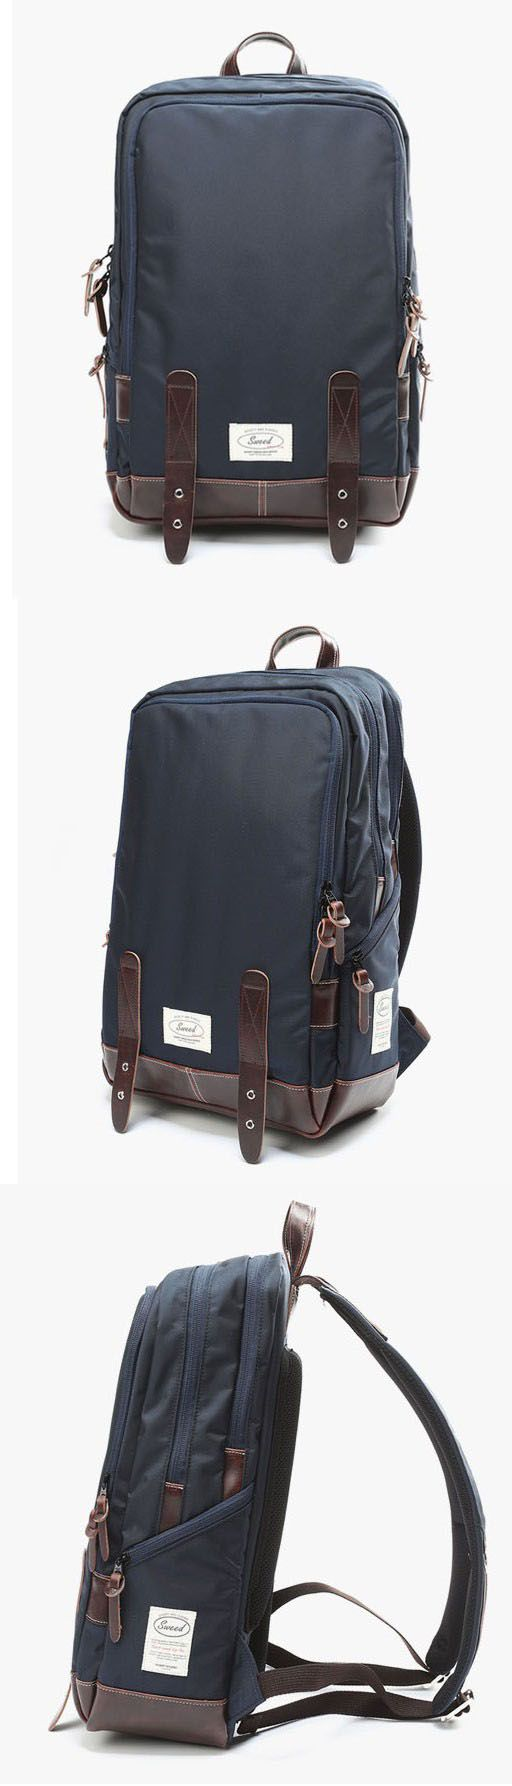 Noart Sweed Blunt Backpack - Laptop & organising pockets, durable body, comfortable shoulder & back. Stylish unique. #backpack #rucksack